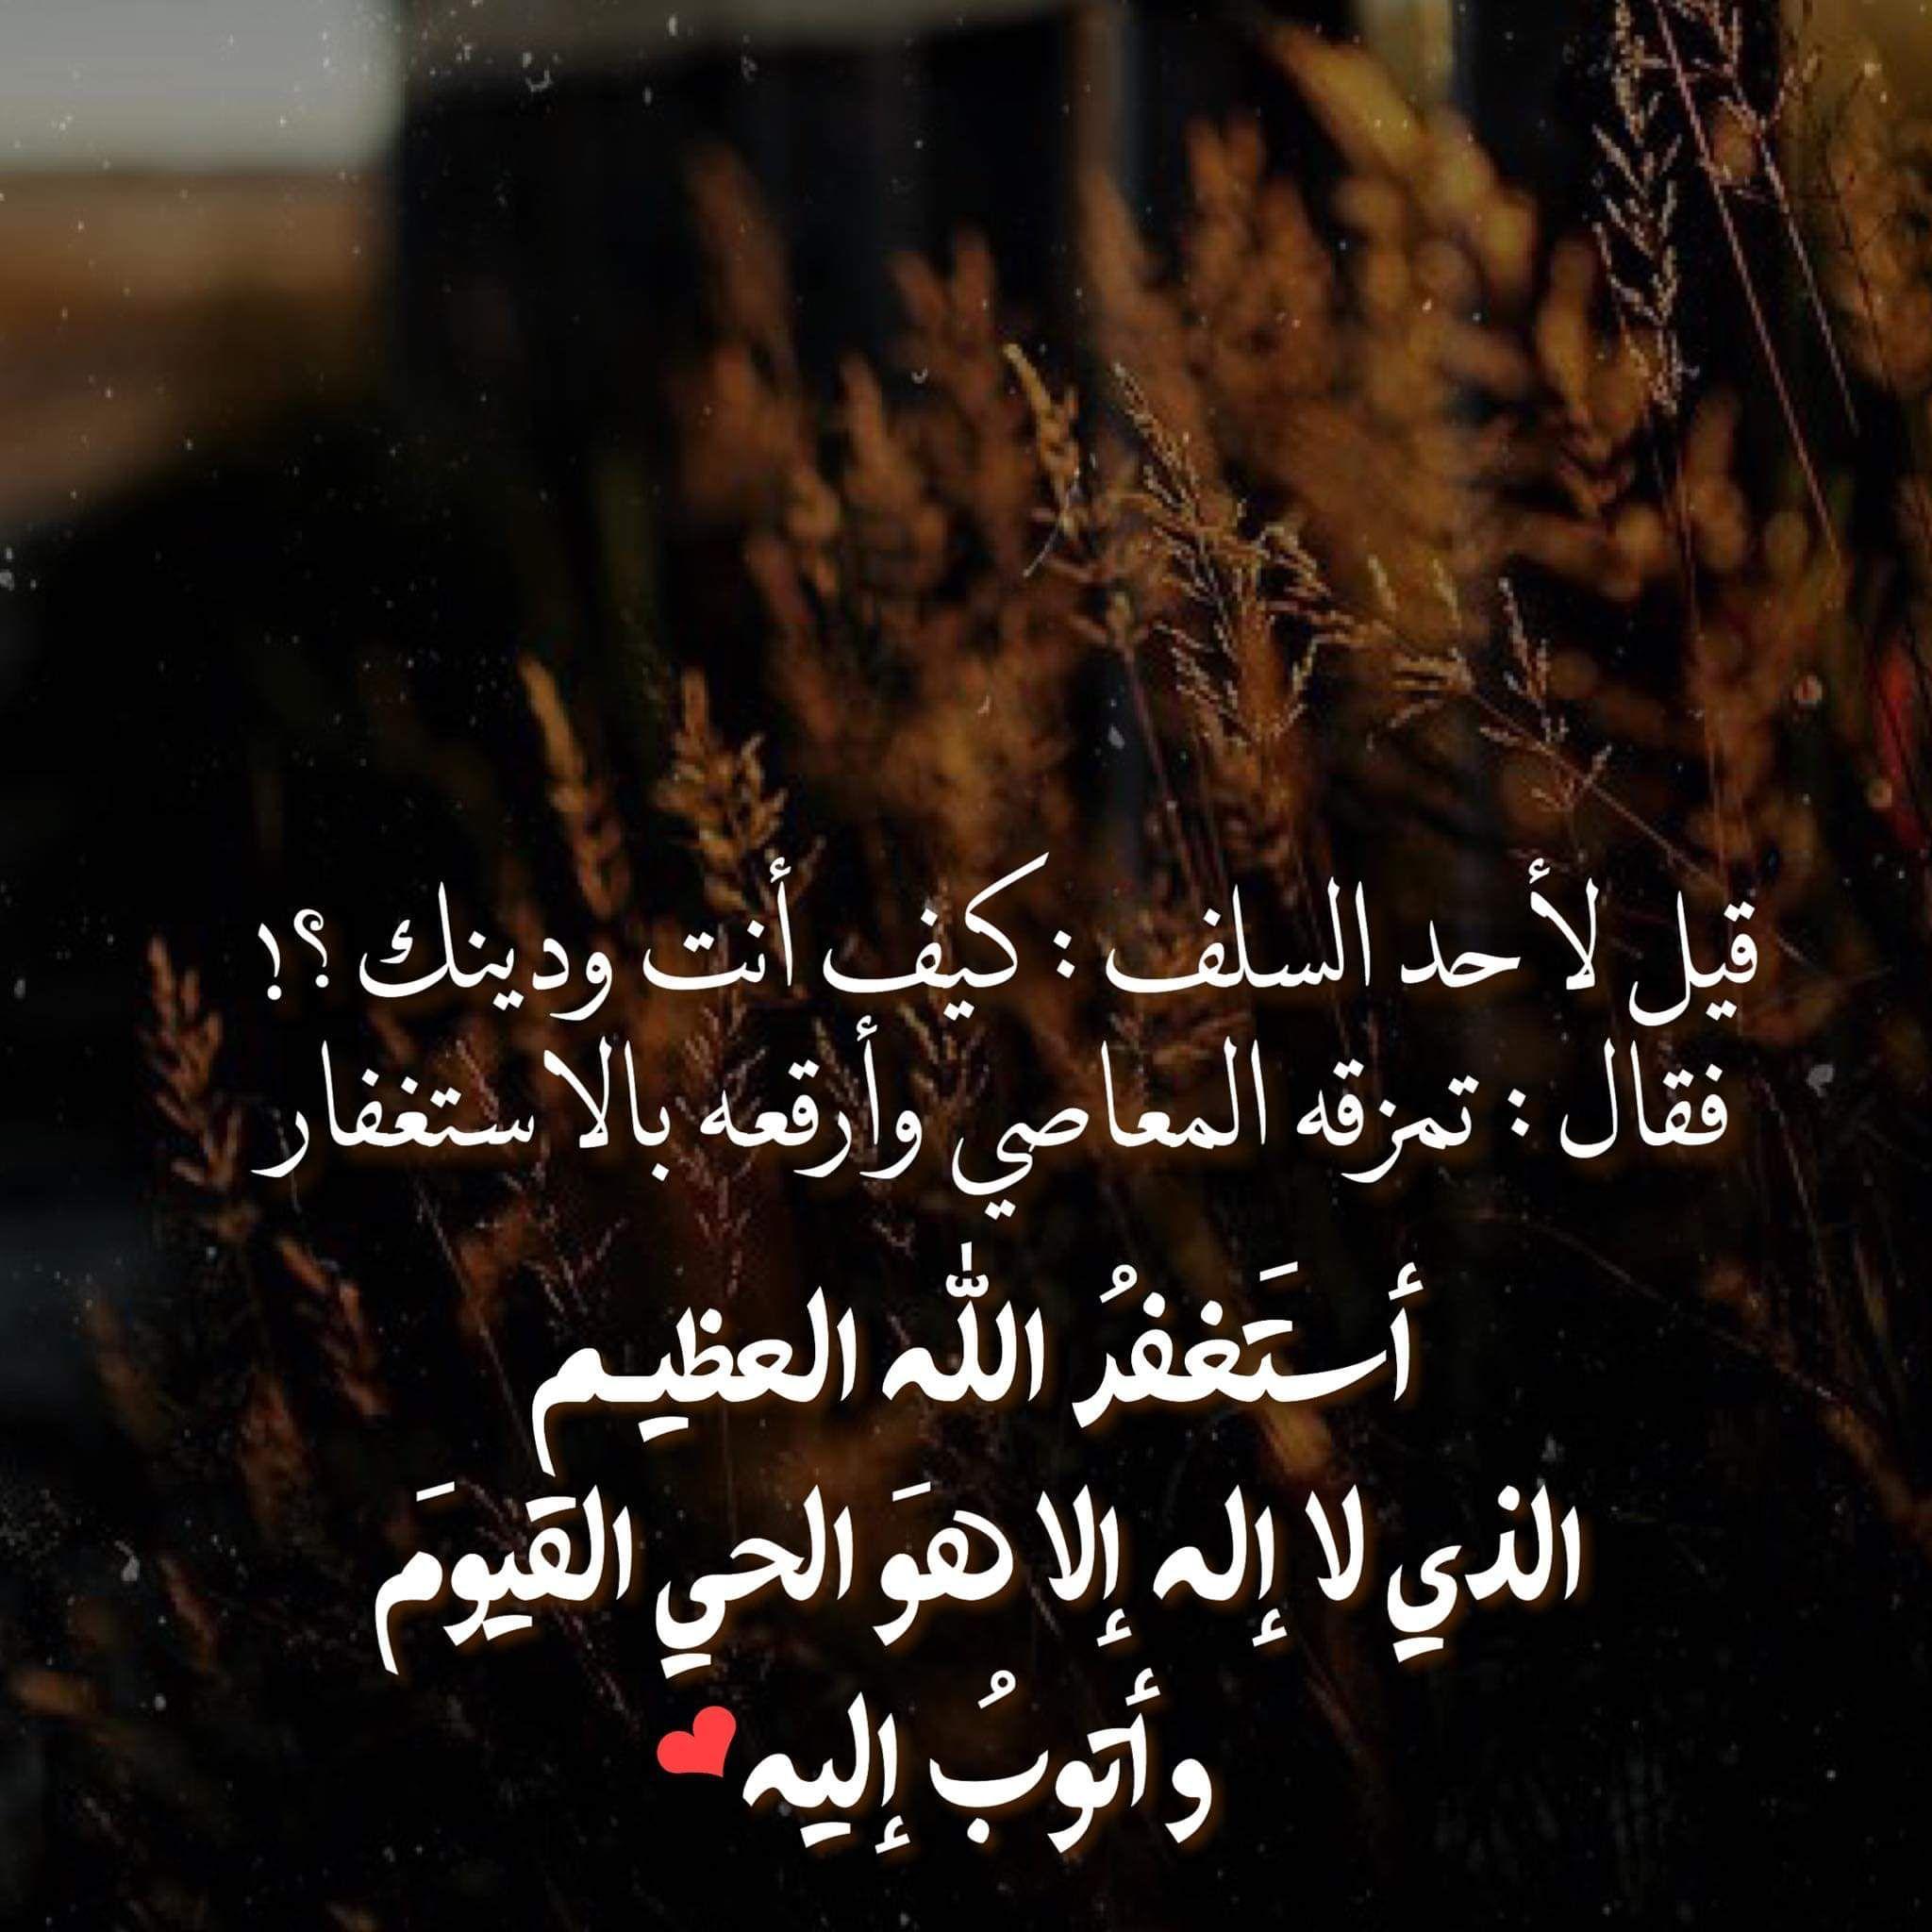 خواطر دينية قصيرة مزخرفة Islamic Quotes Arabic Typing Islamic Pictures